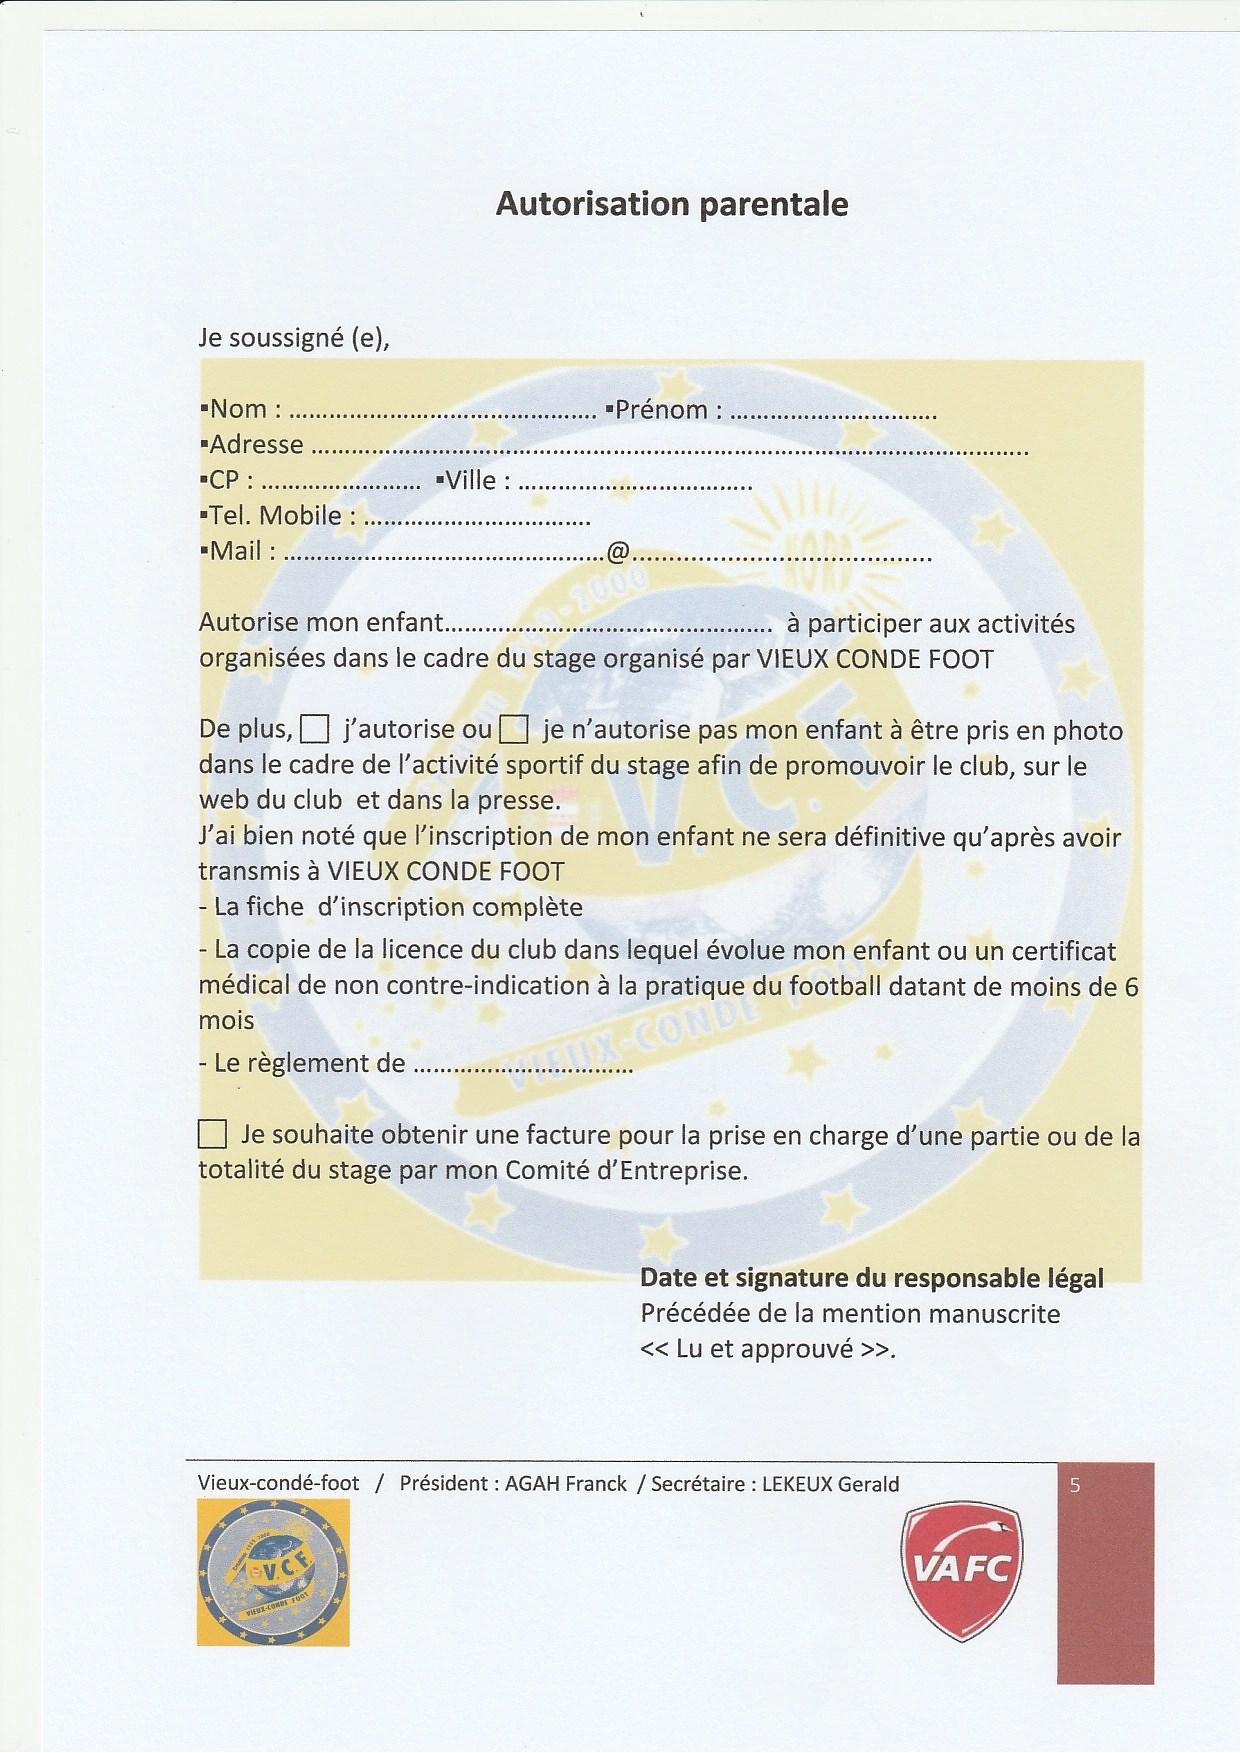 dossier page 5.jpg